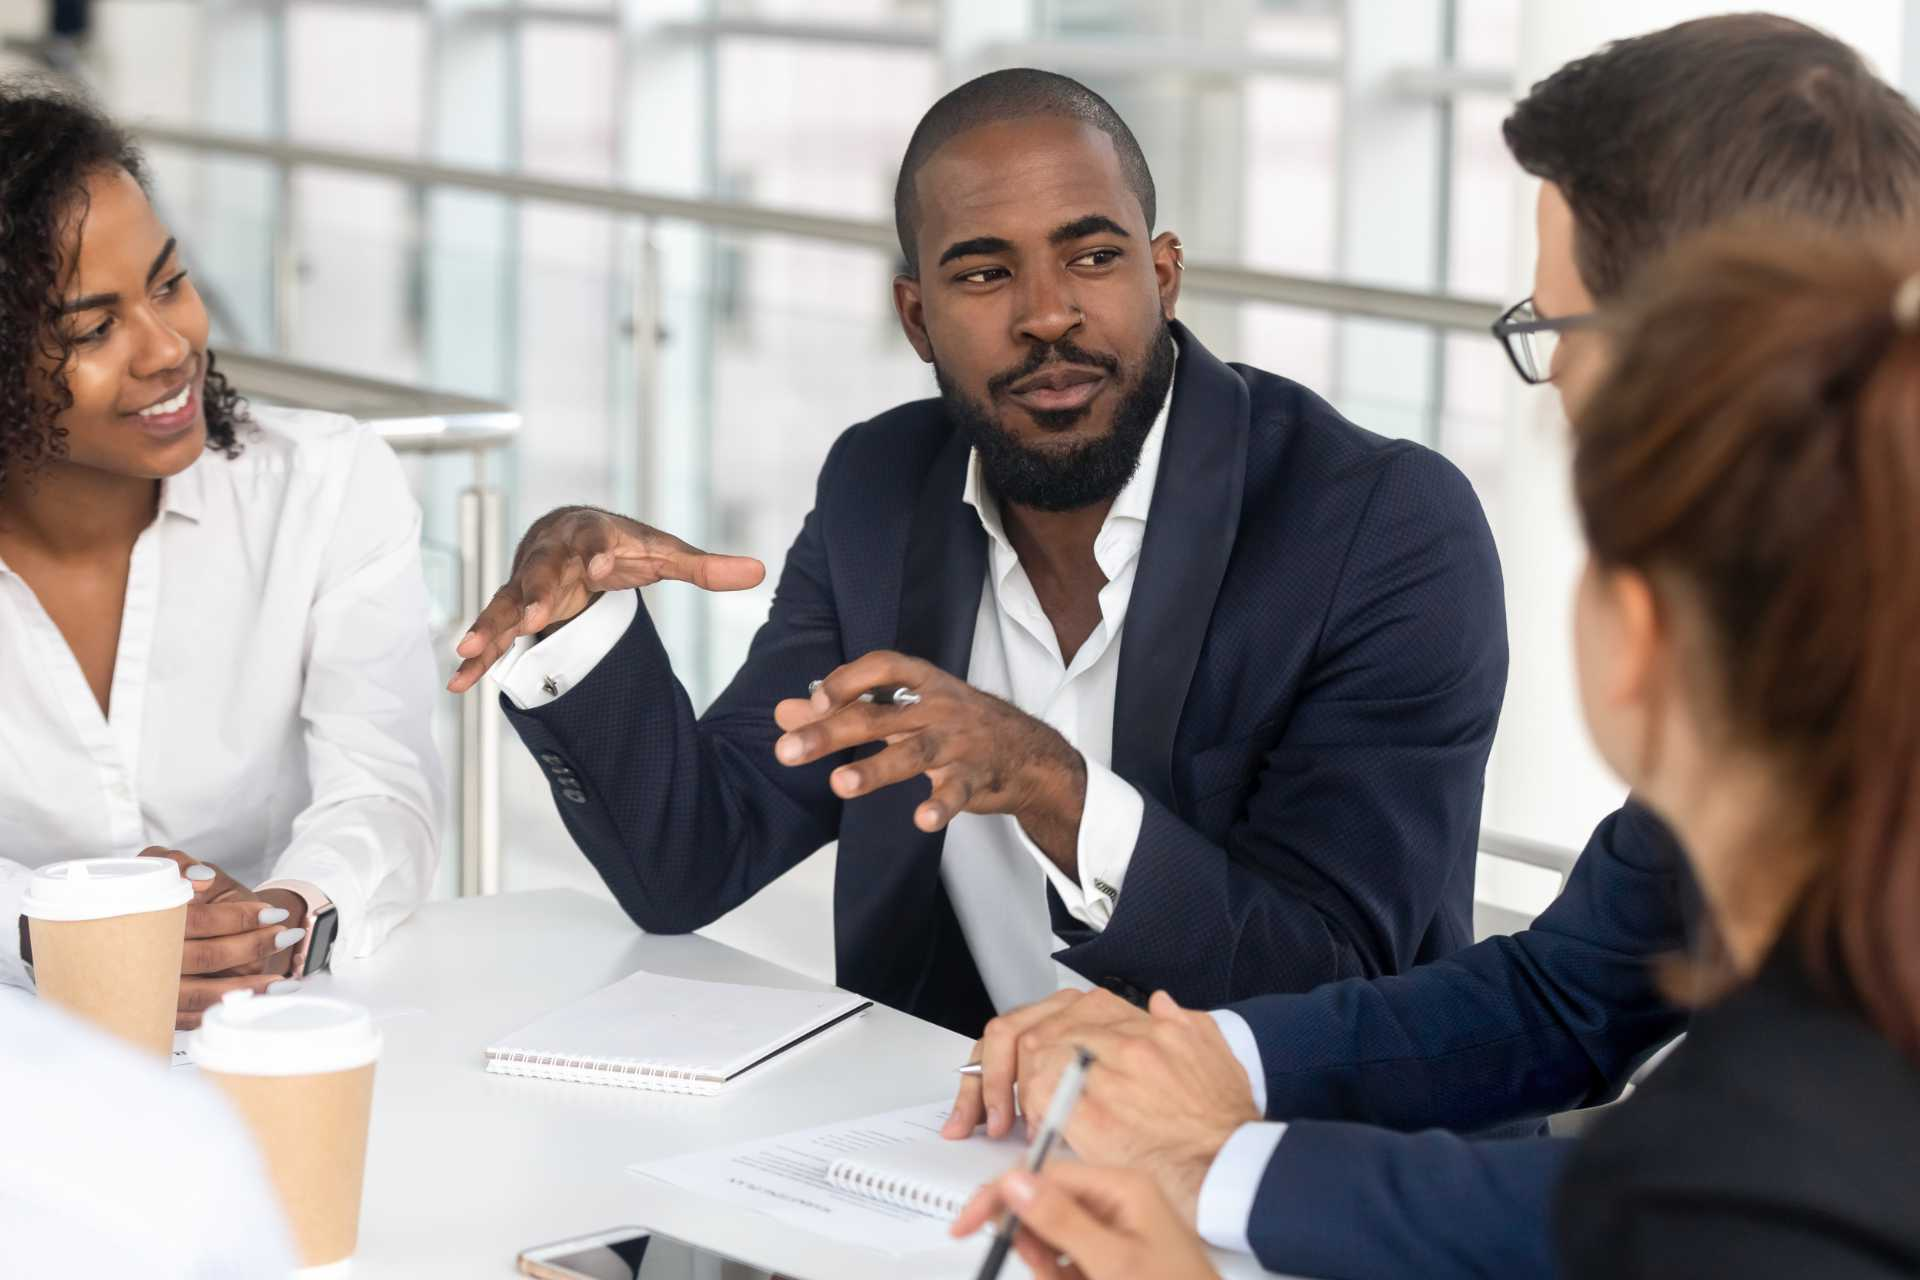 Man leads group meeting